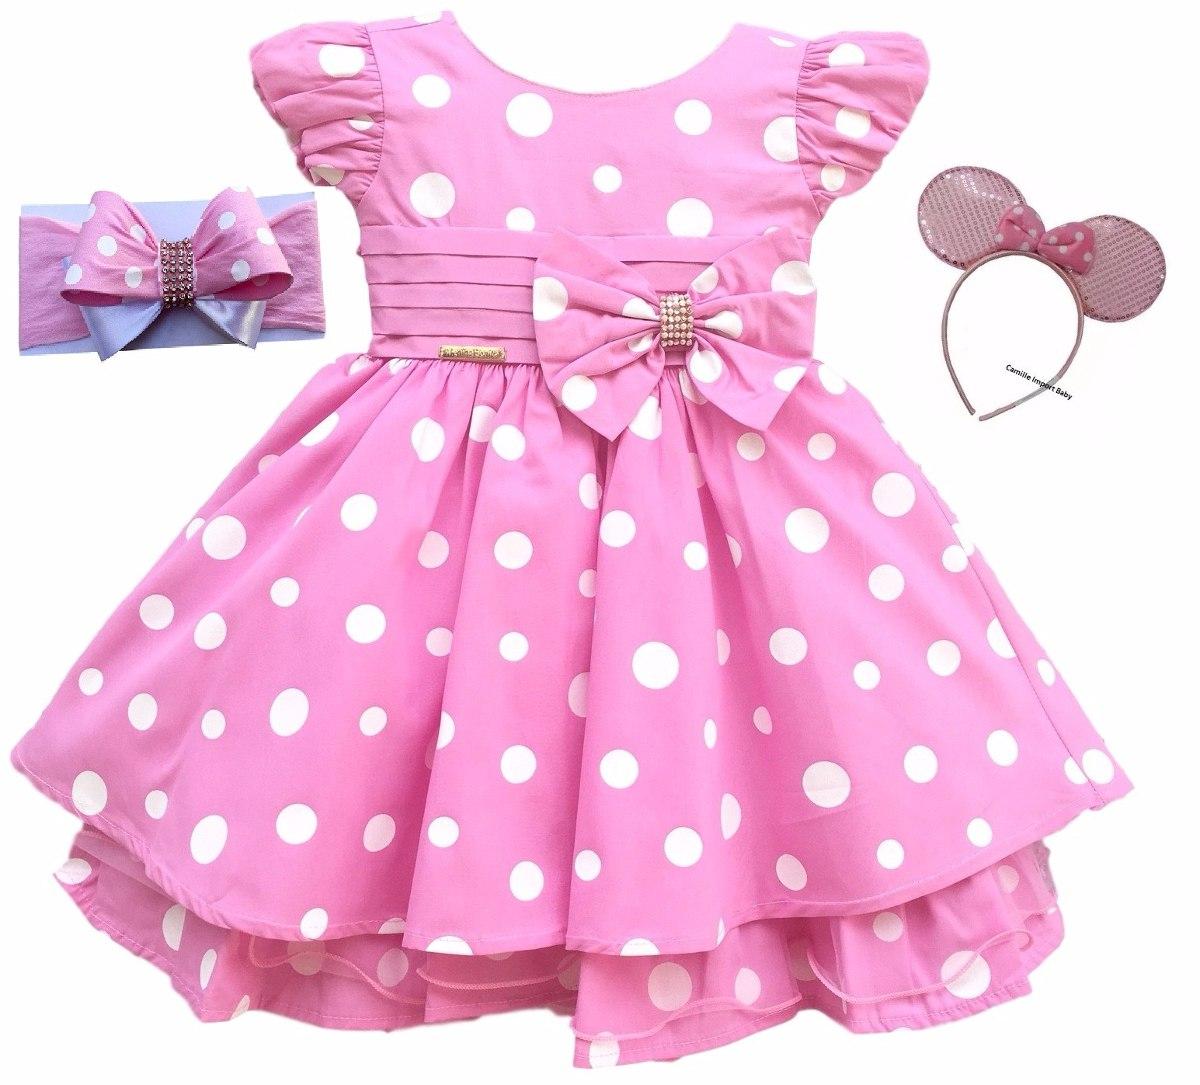 Vestido Minnie Rosa Luxo Infantil Luxo Com 2 Tiaras Minei R 105